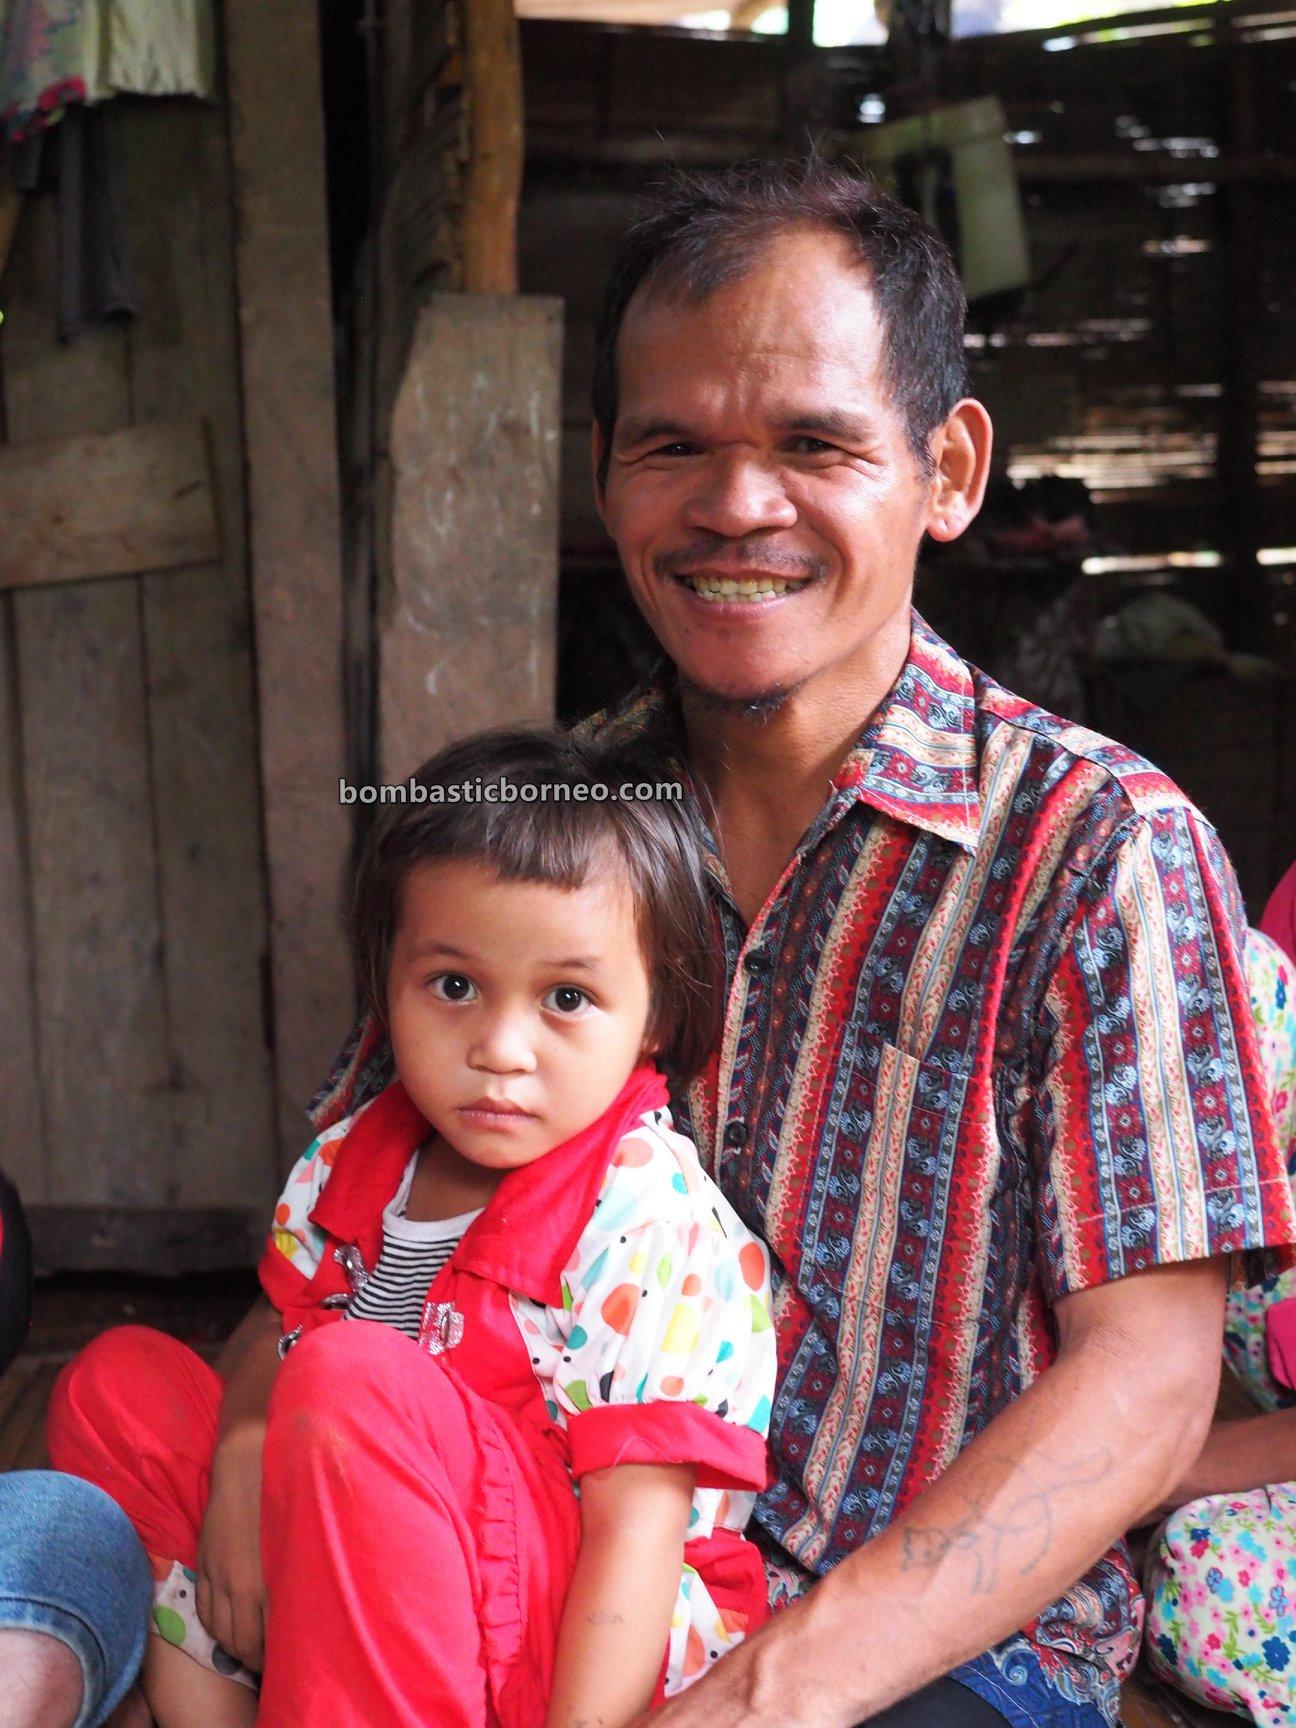 indigenous, culture, Kalimantan Barat, Siding, paddy harvest festival, event, ethnic, tribe, Dayak Bidayuh, Obyek wisata, Tourism, Borneo, 印尼西加里曼丹, 孟加映原住民部落